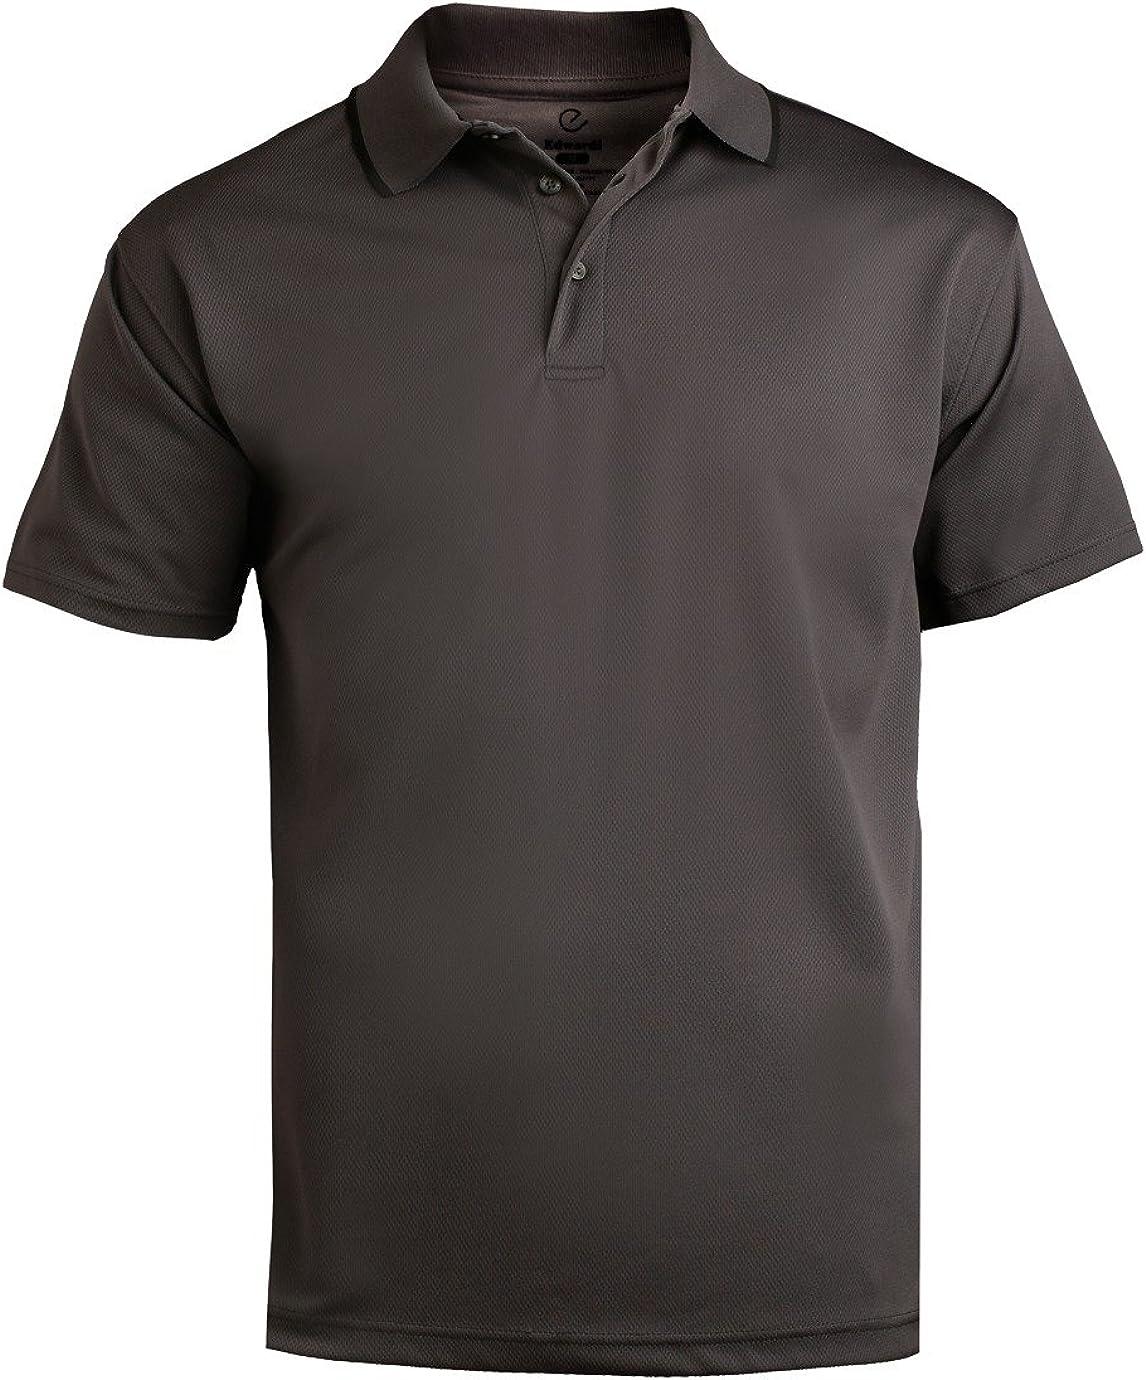 Ed Garments Men's Big And Tall Performance Polo Shirt, STEELE GREY, 6XLT